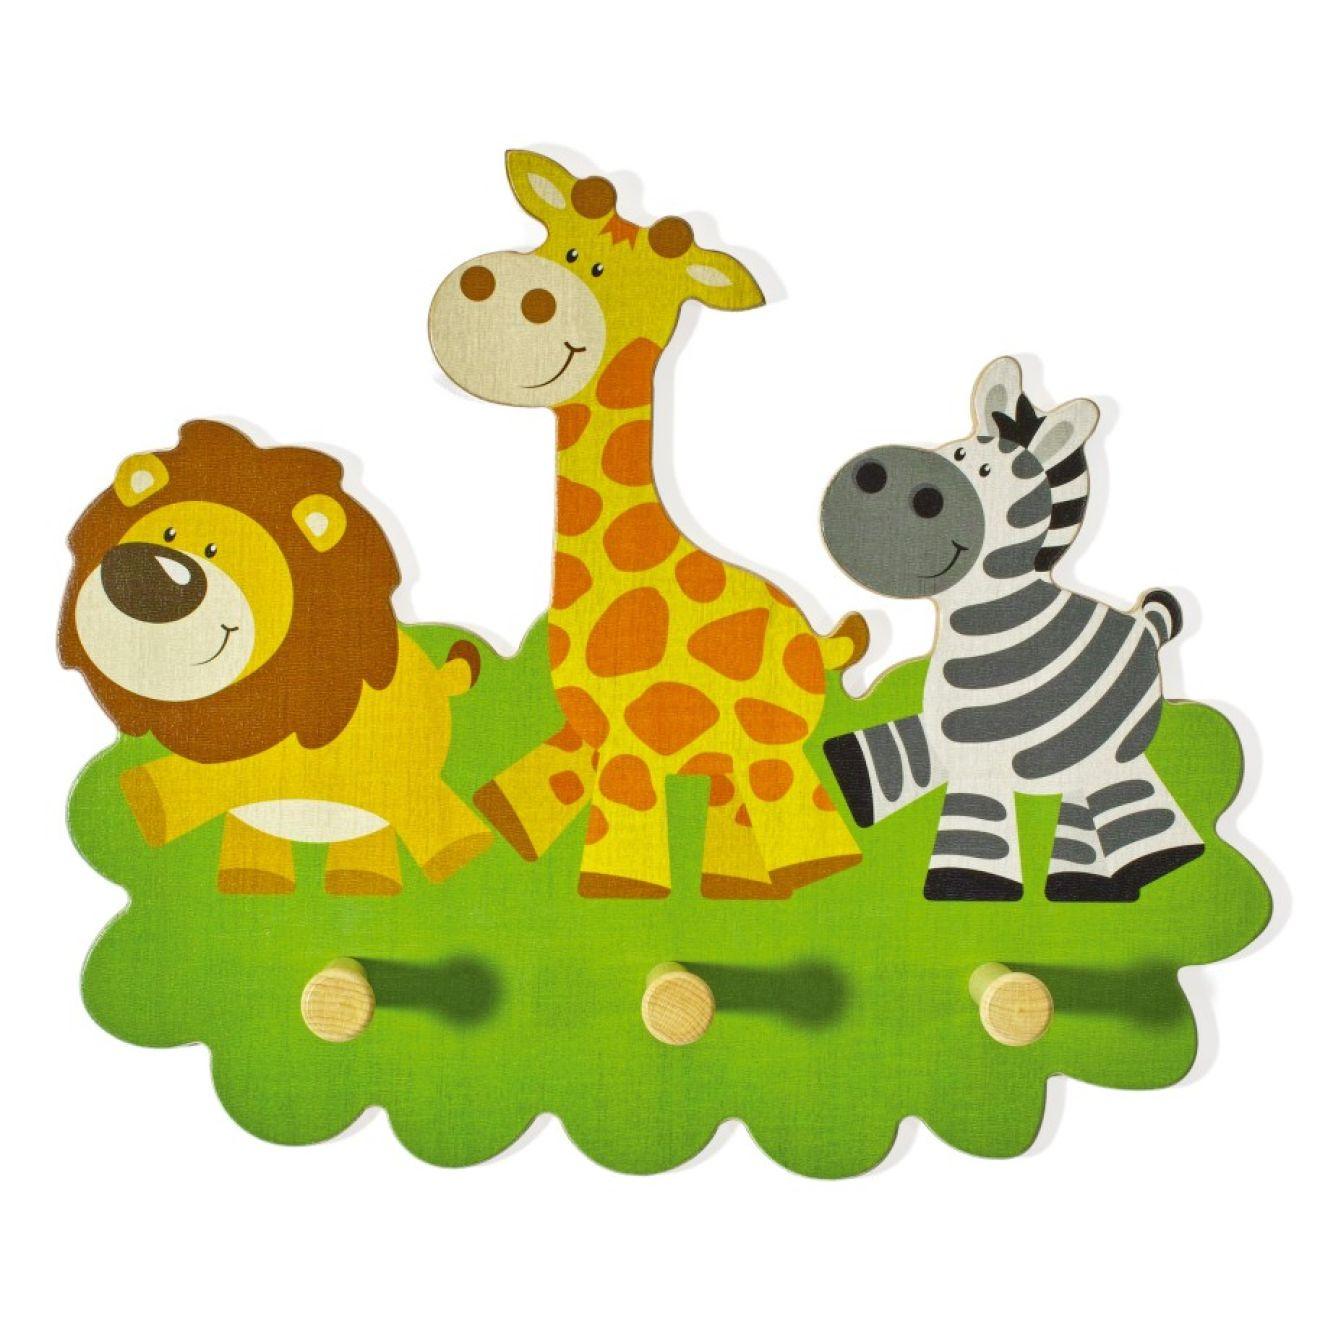 garderobe kinder tiere holz giraffe kindergarderobe 3. Black Bedroom Furniture Sets. Home Design Ideas